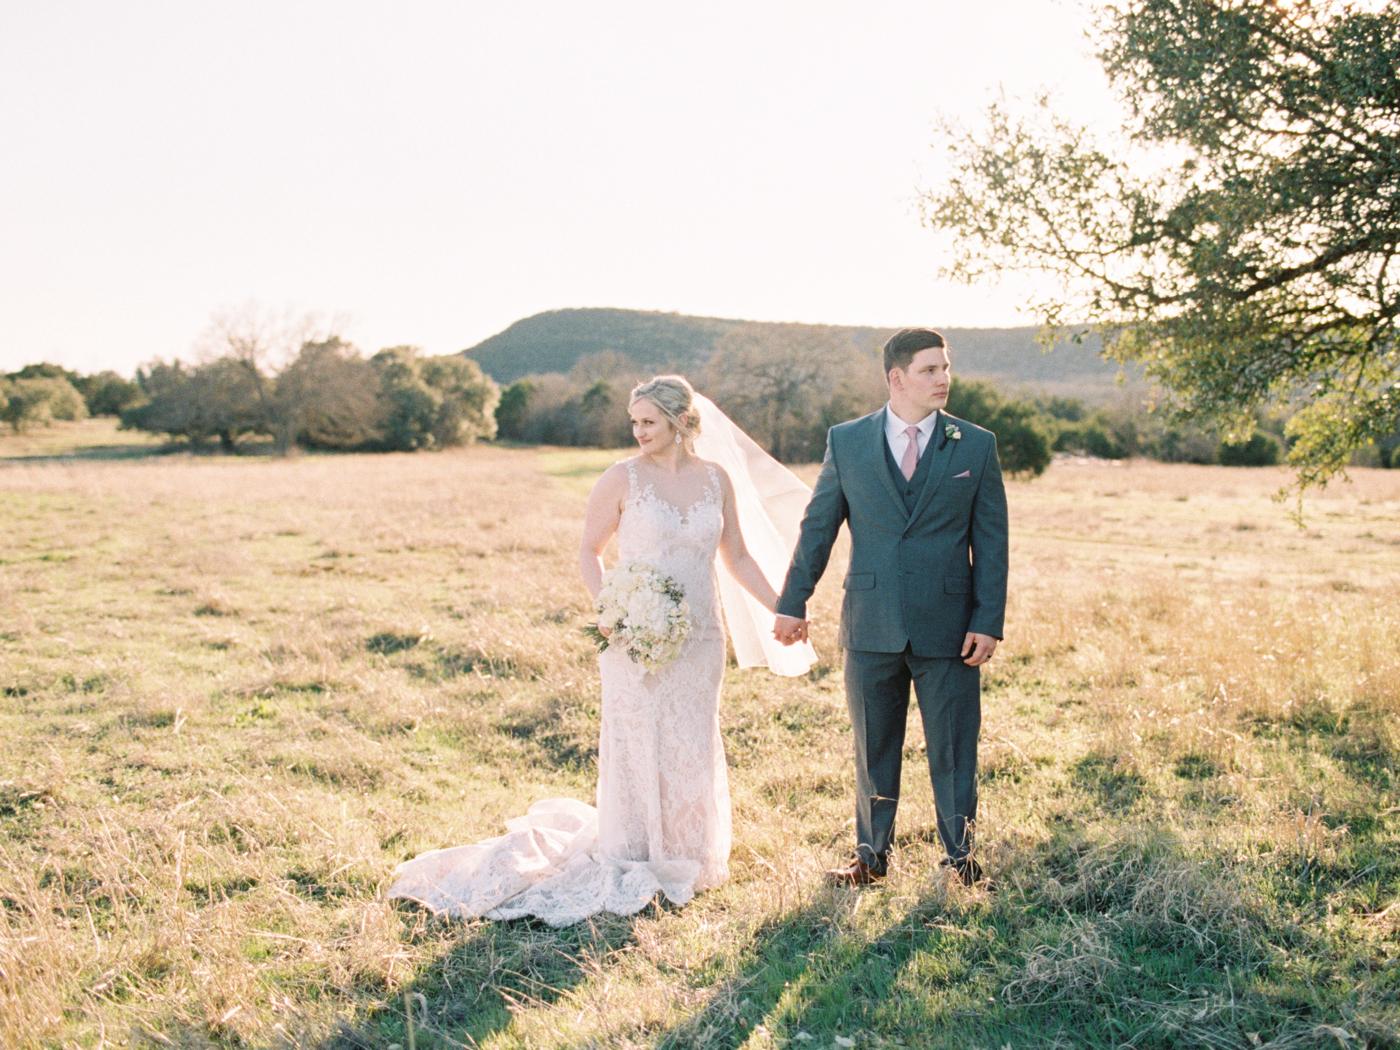 Wichita Falls, TX Wedding Photographer - Fine Art Film Photography